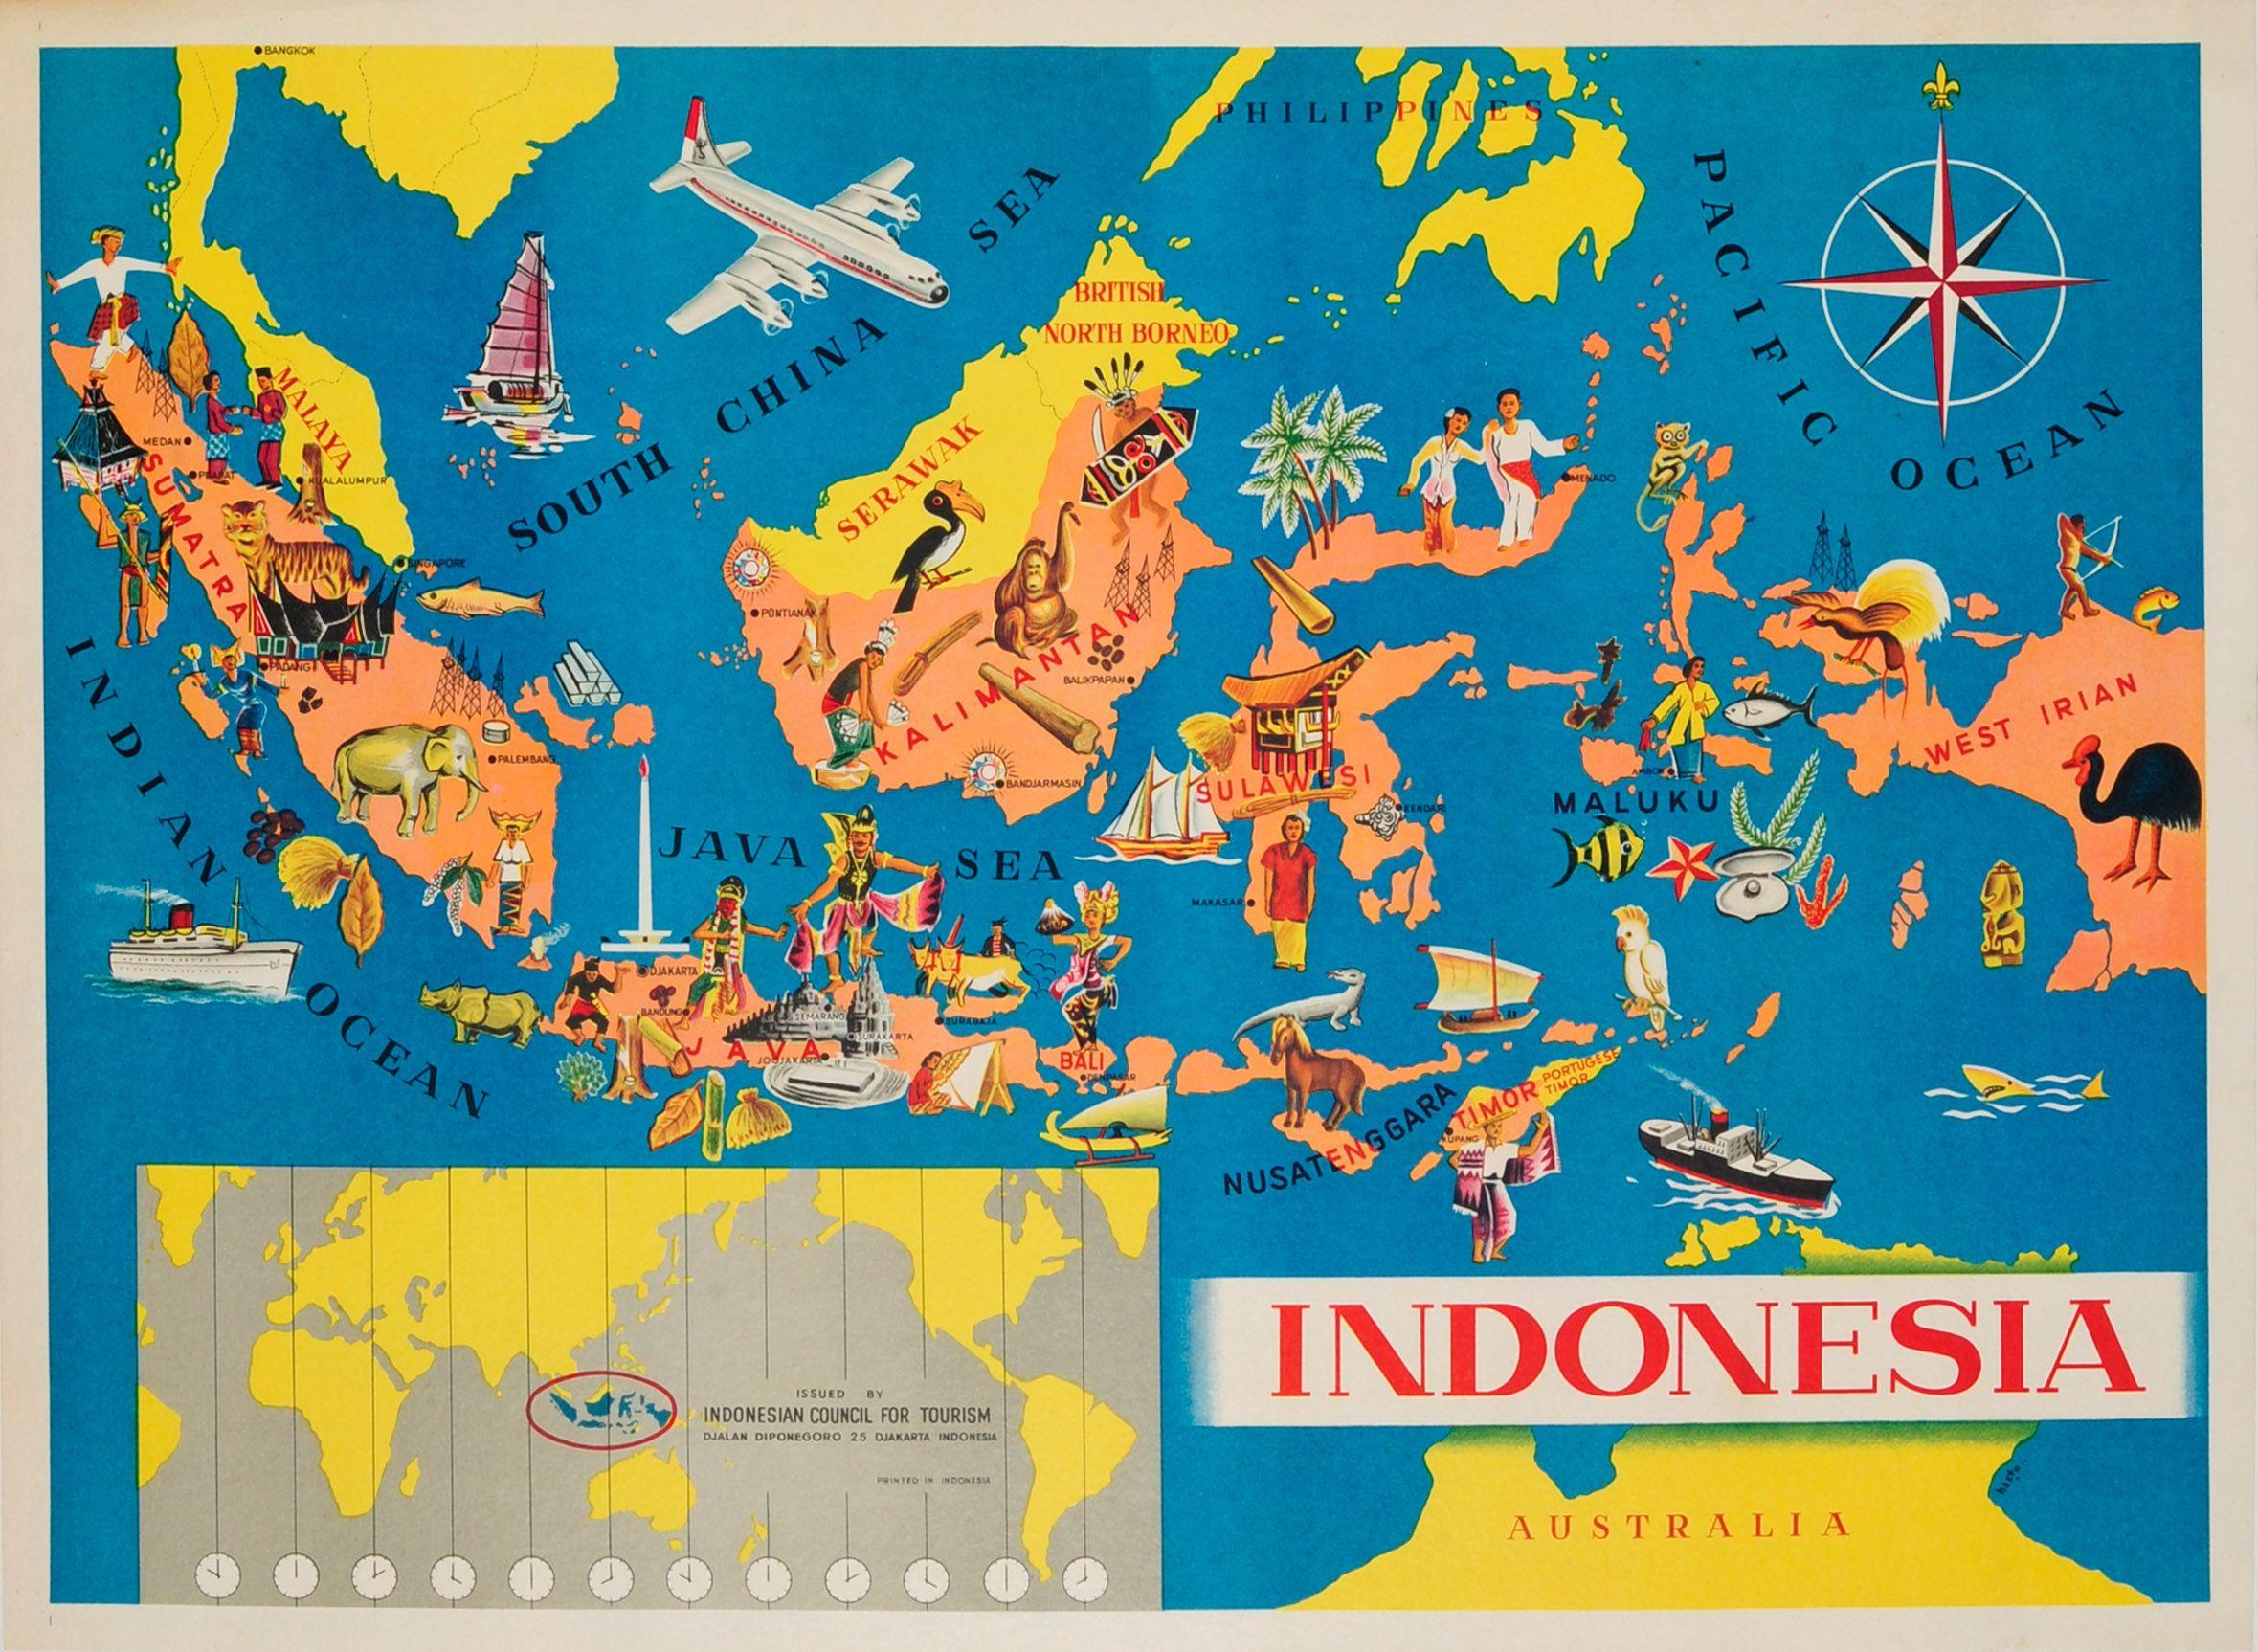 Indonesia pictorial map 1950s original vintage poster listed on indonesia pictorial map 1950s original vintage poster listed on antikbar gumiabroncs Images